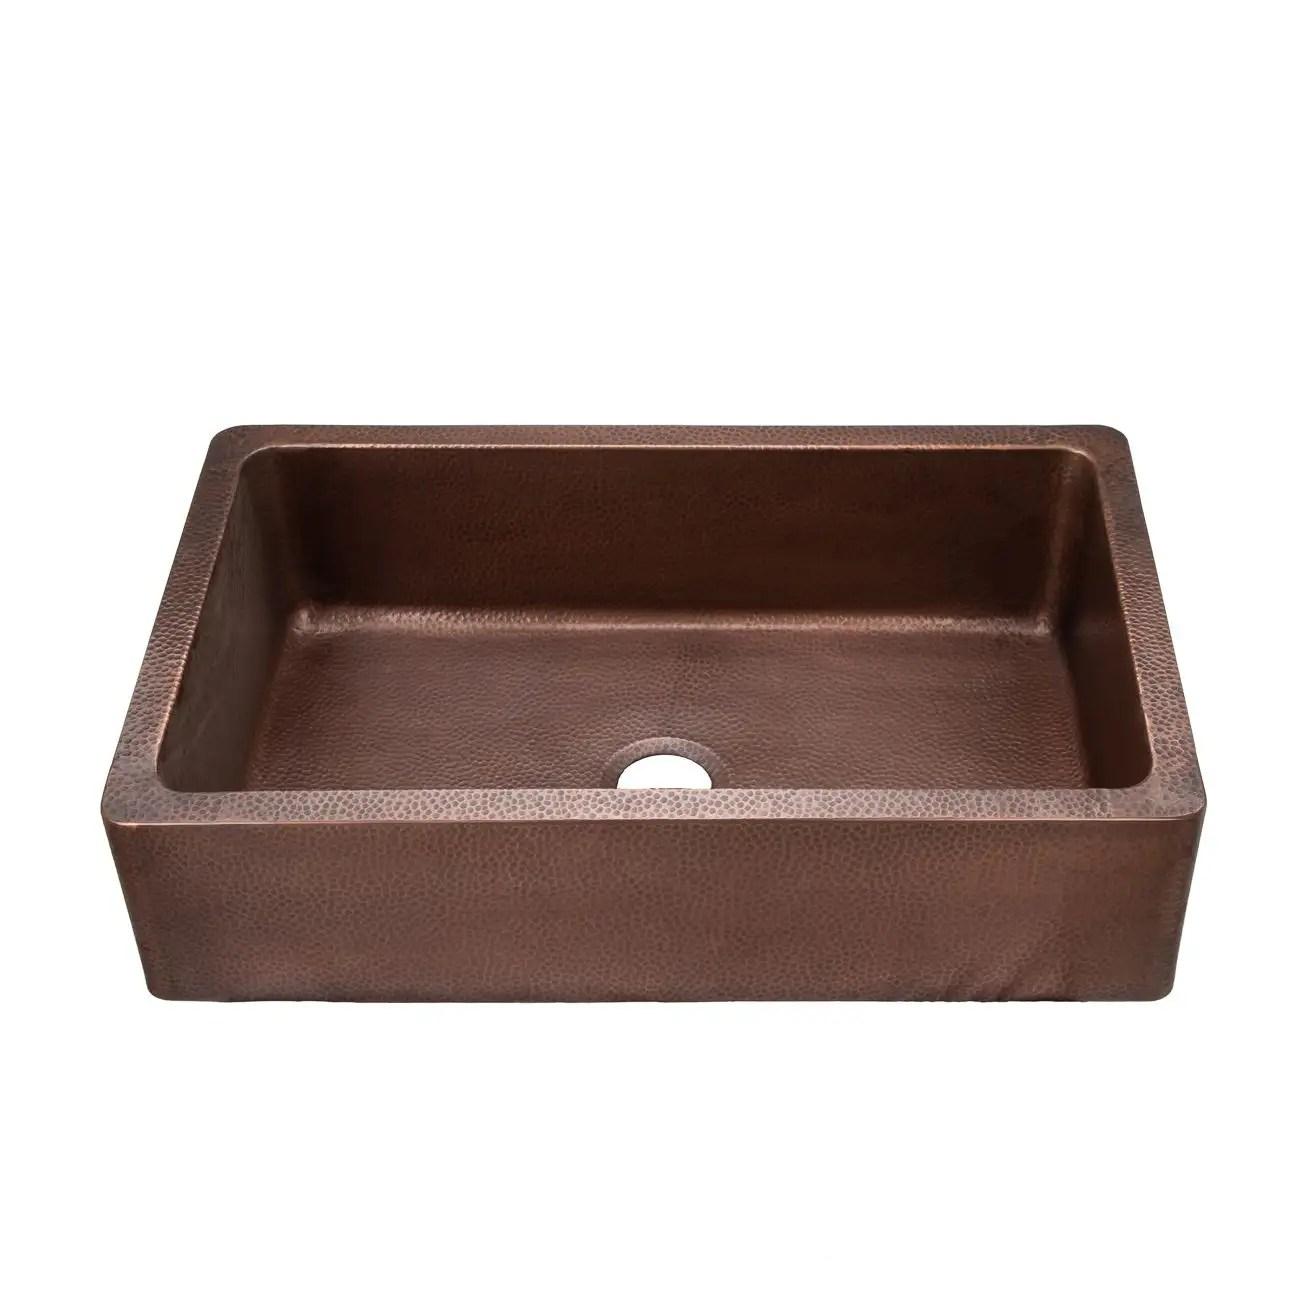 36 inch copper single bowl apron farmhouse sink